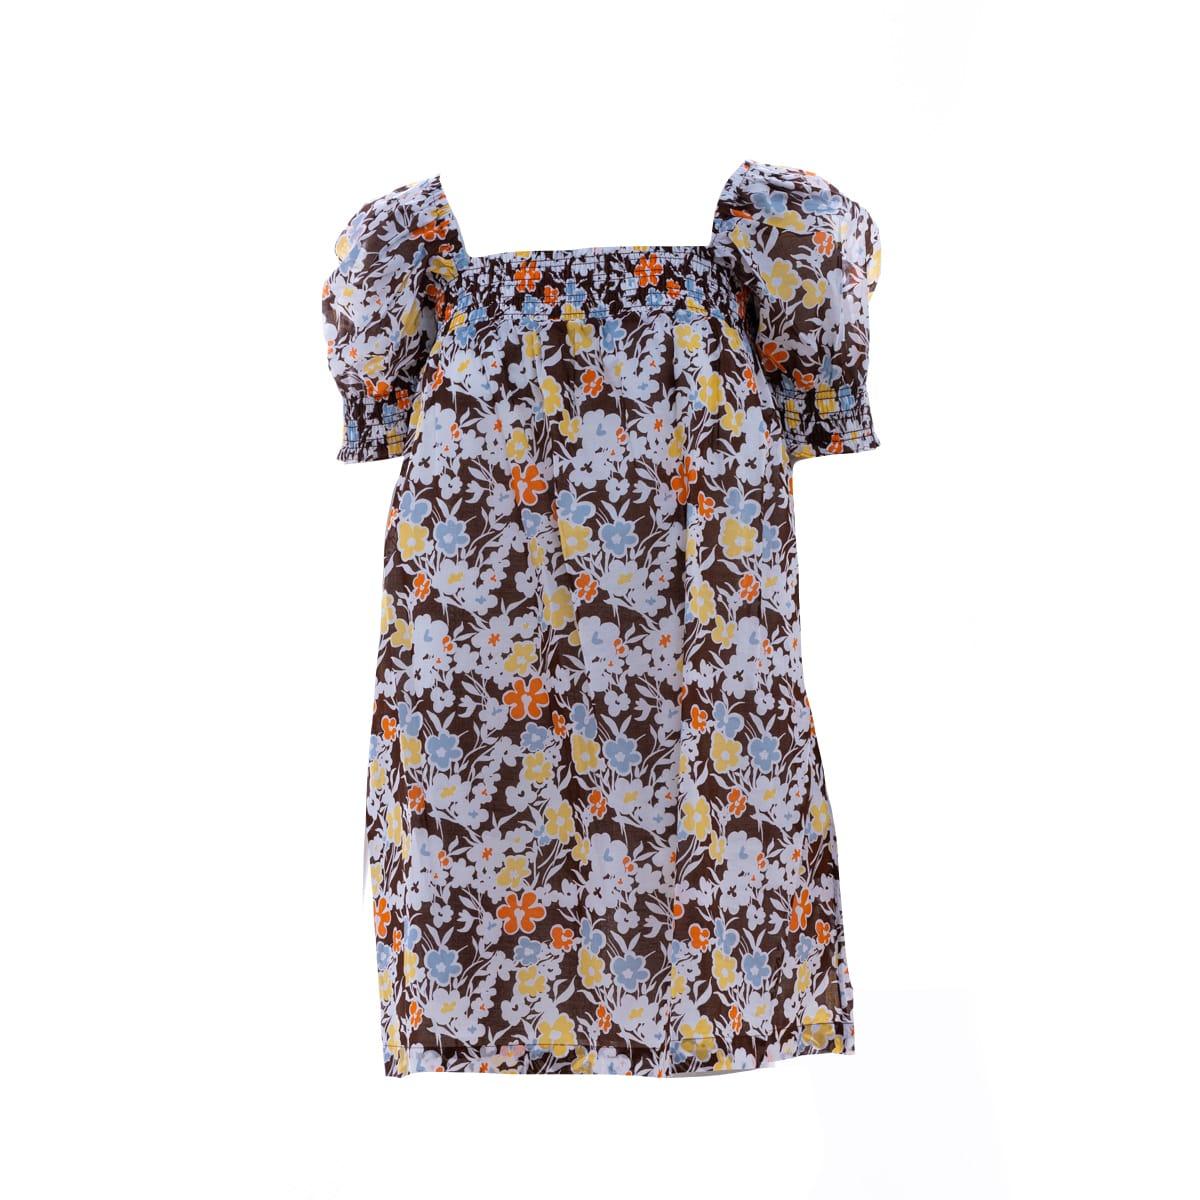 Buy Tory Burch Tory Burch Dress online, shop Tory Burch with free shipping